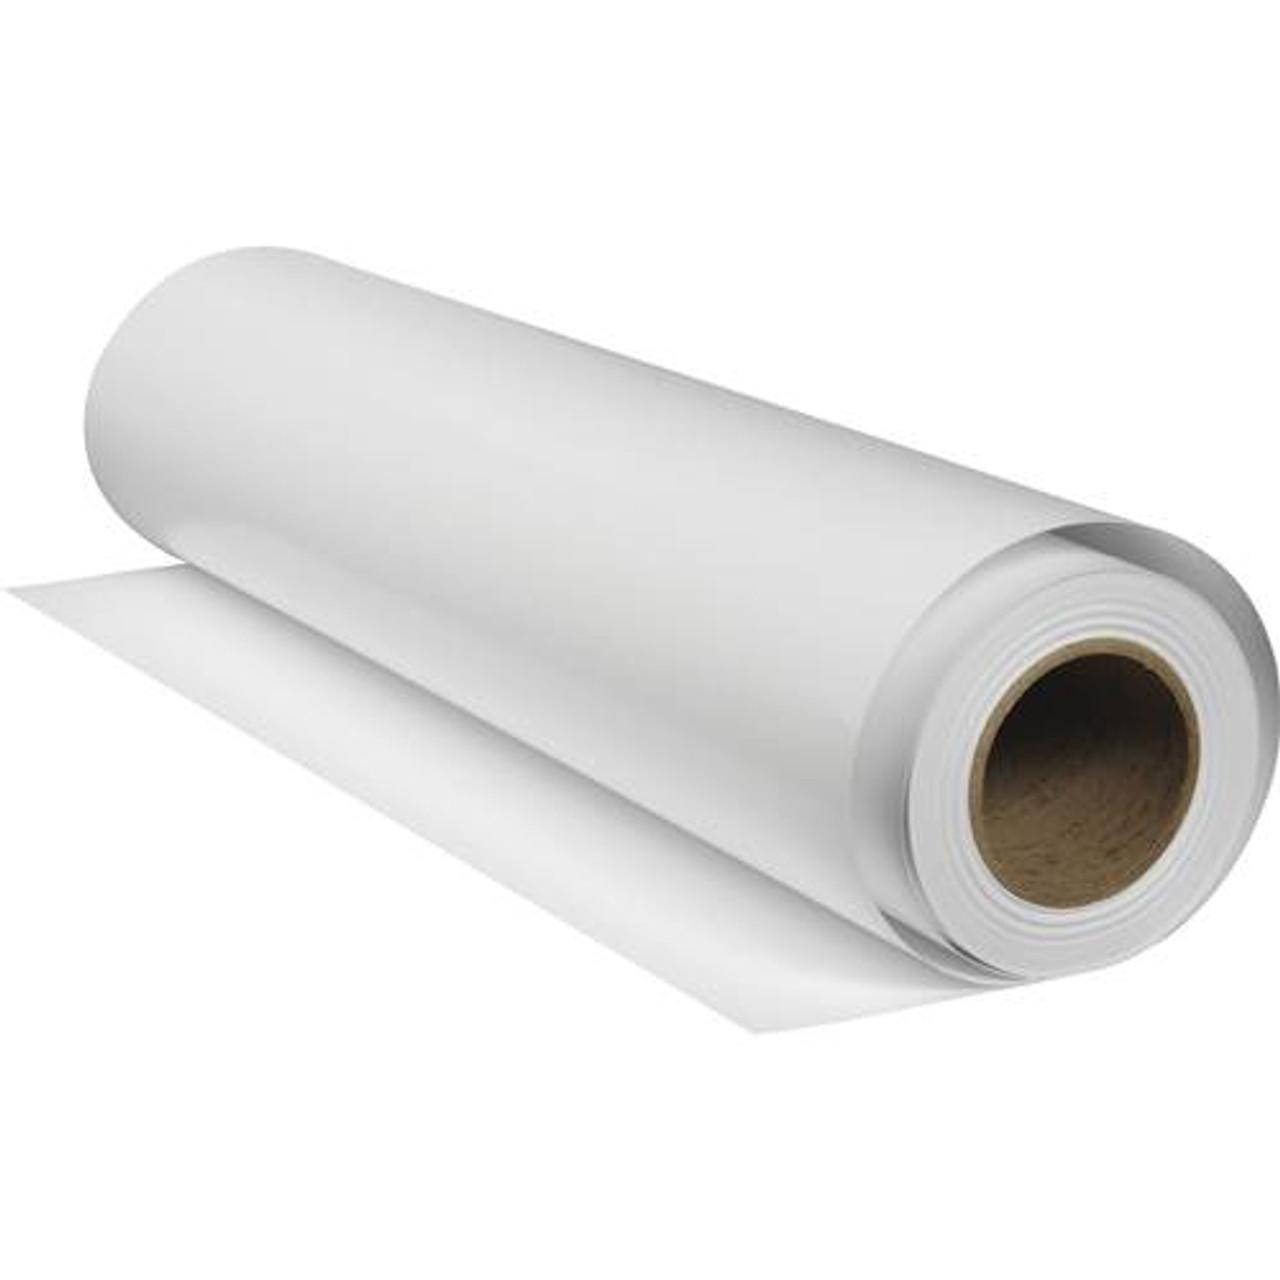 "Epson Premium Glossy Photo Paper (250) 16""x 100' Roll"